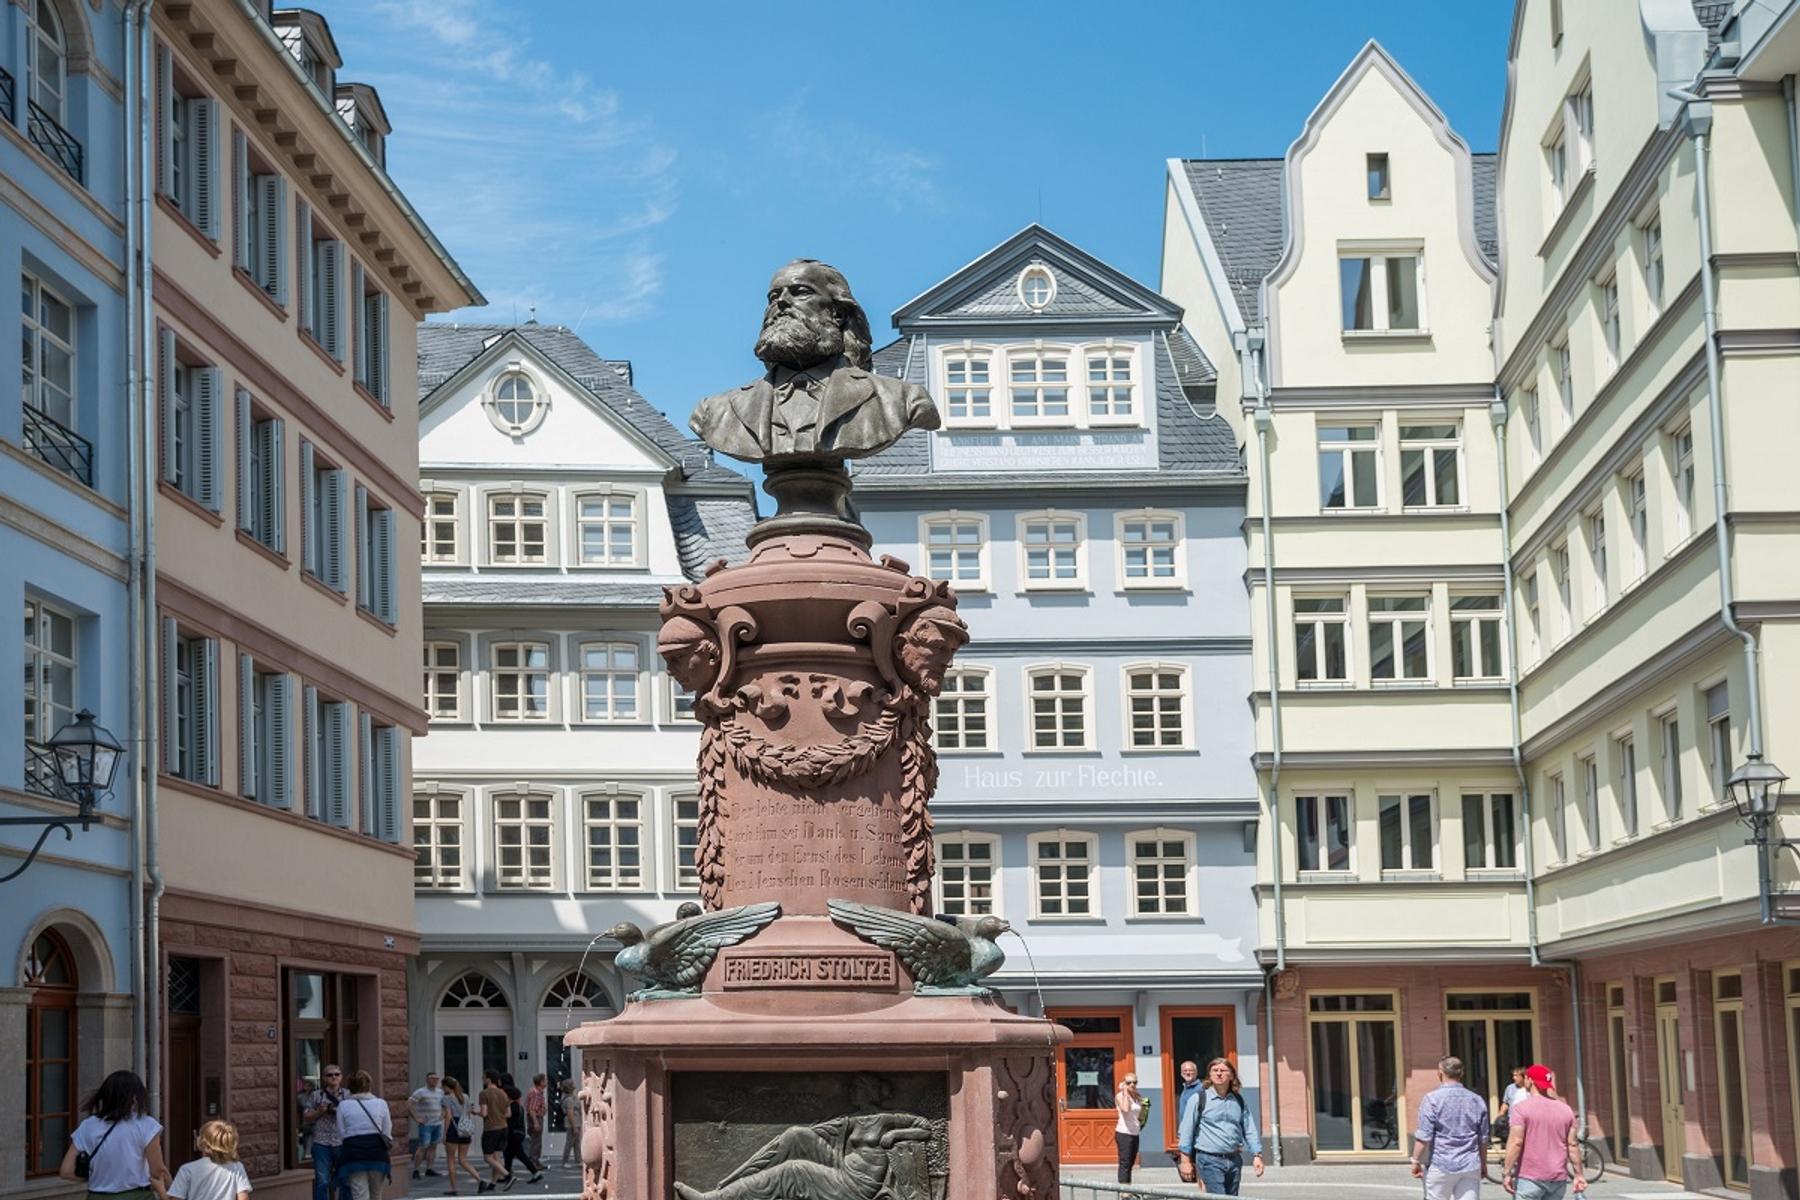 Stoltze-Brunnen in der Neuen Frankfurter Altstadt